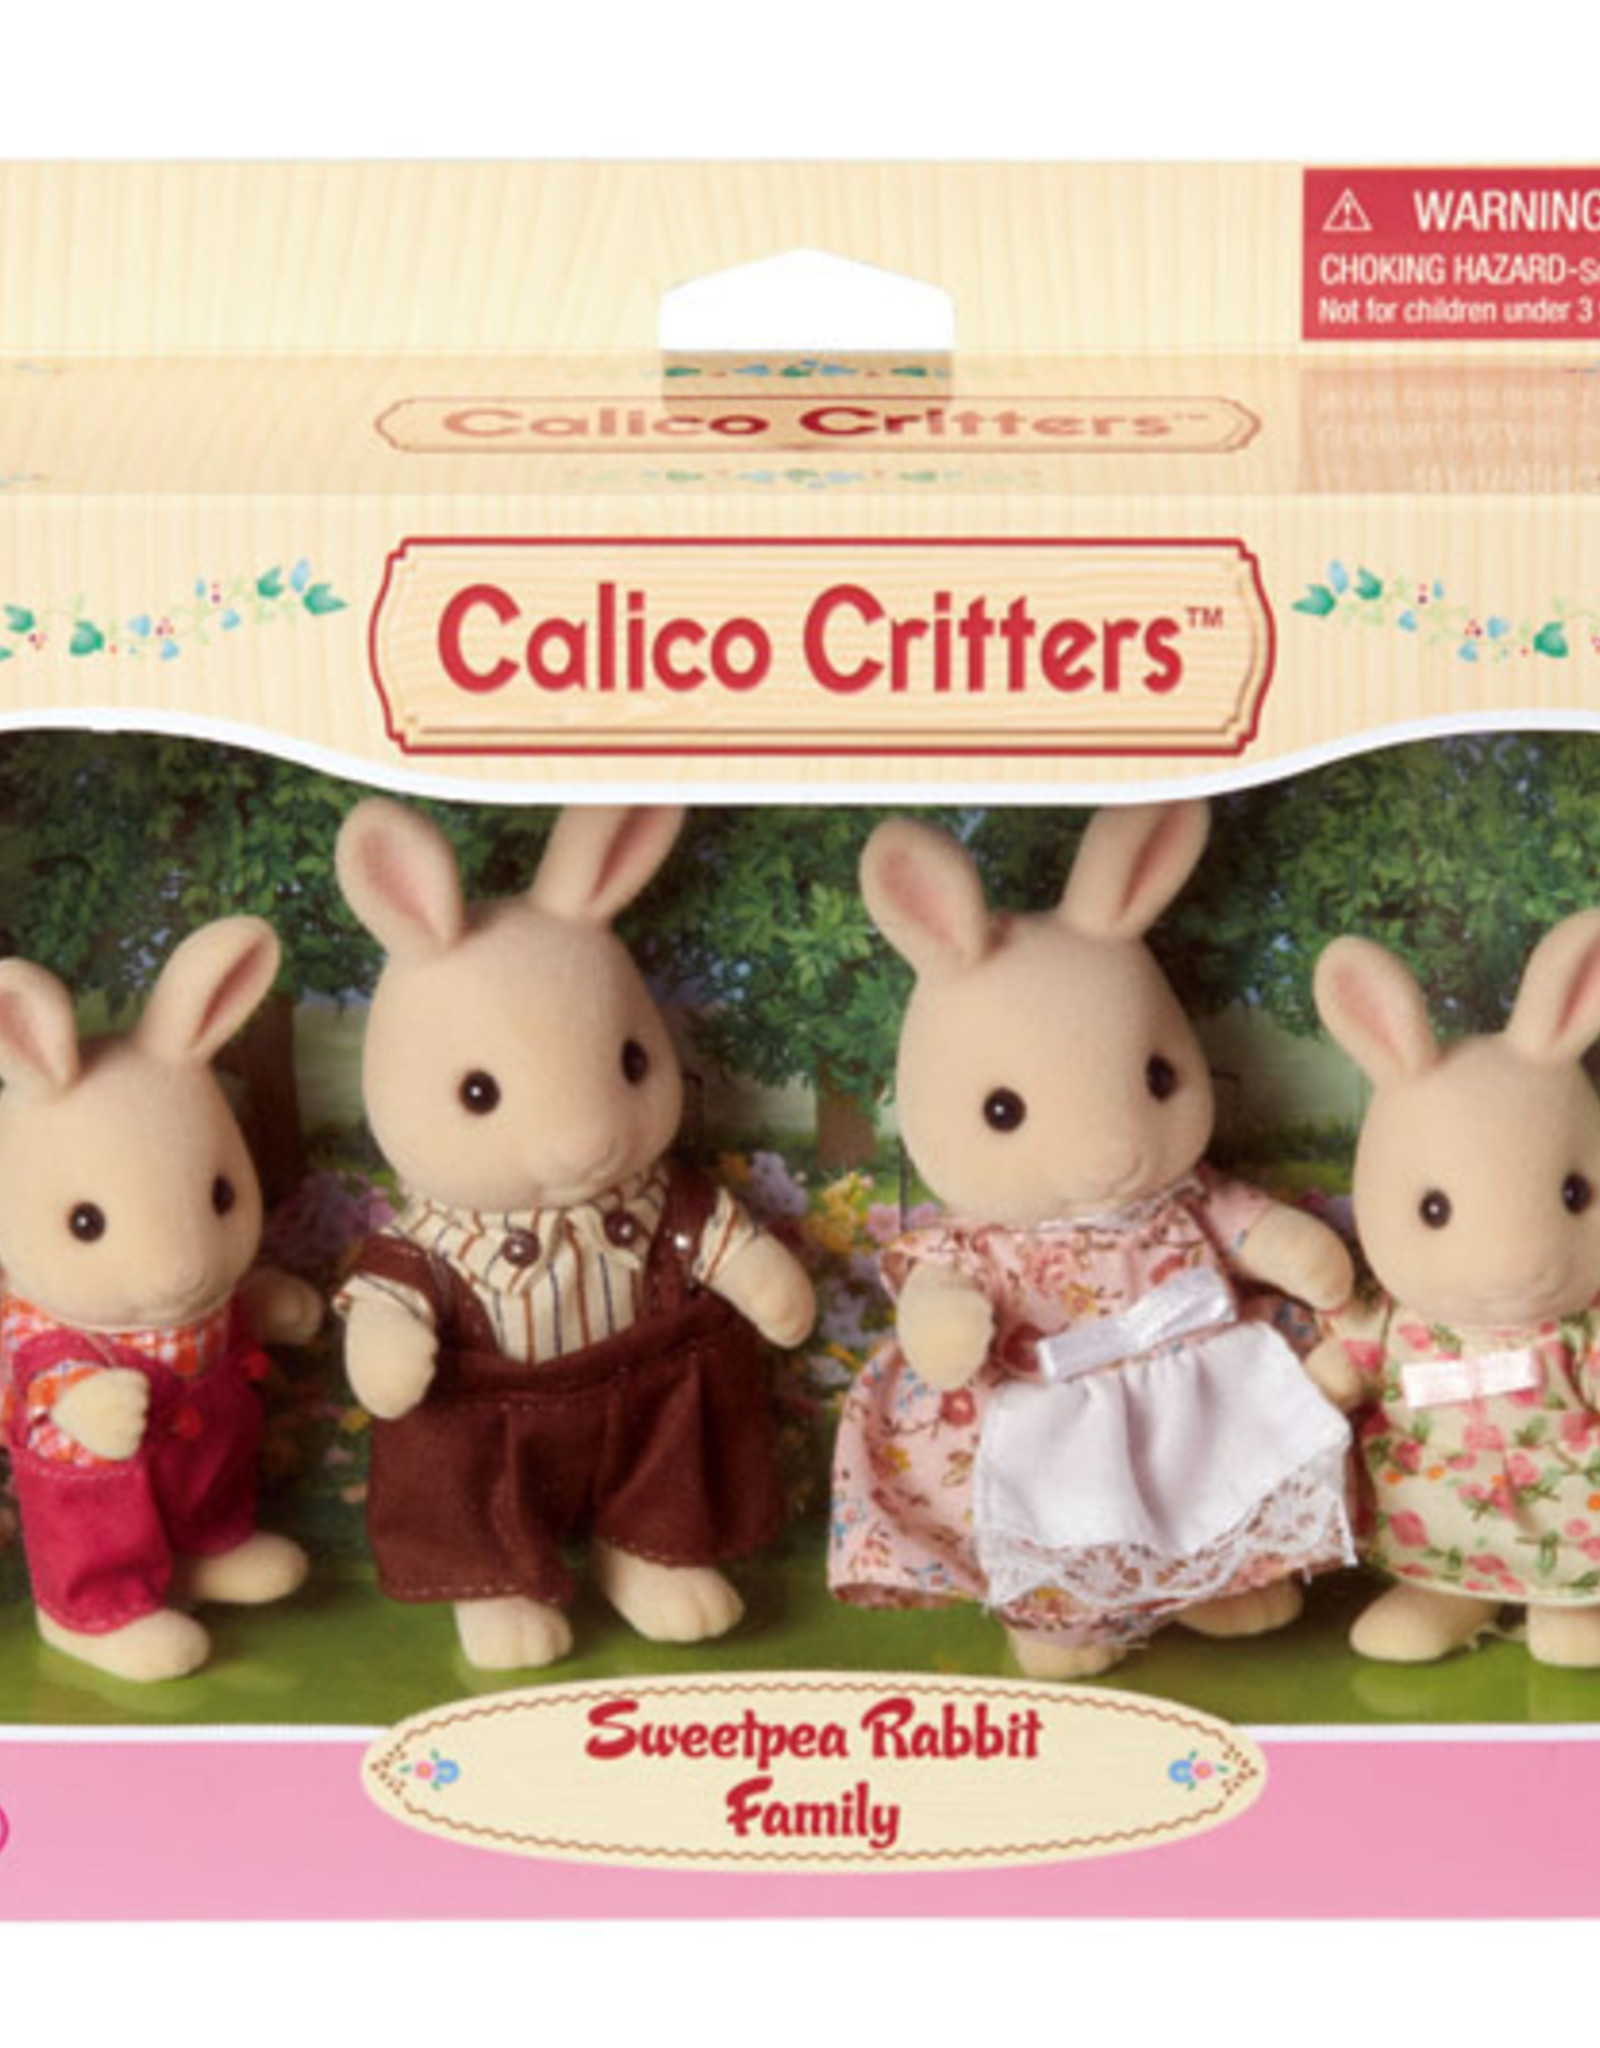 Calico Critters CC Sweetpea Rabbit Family